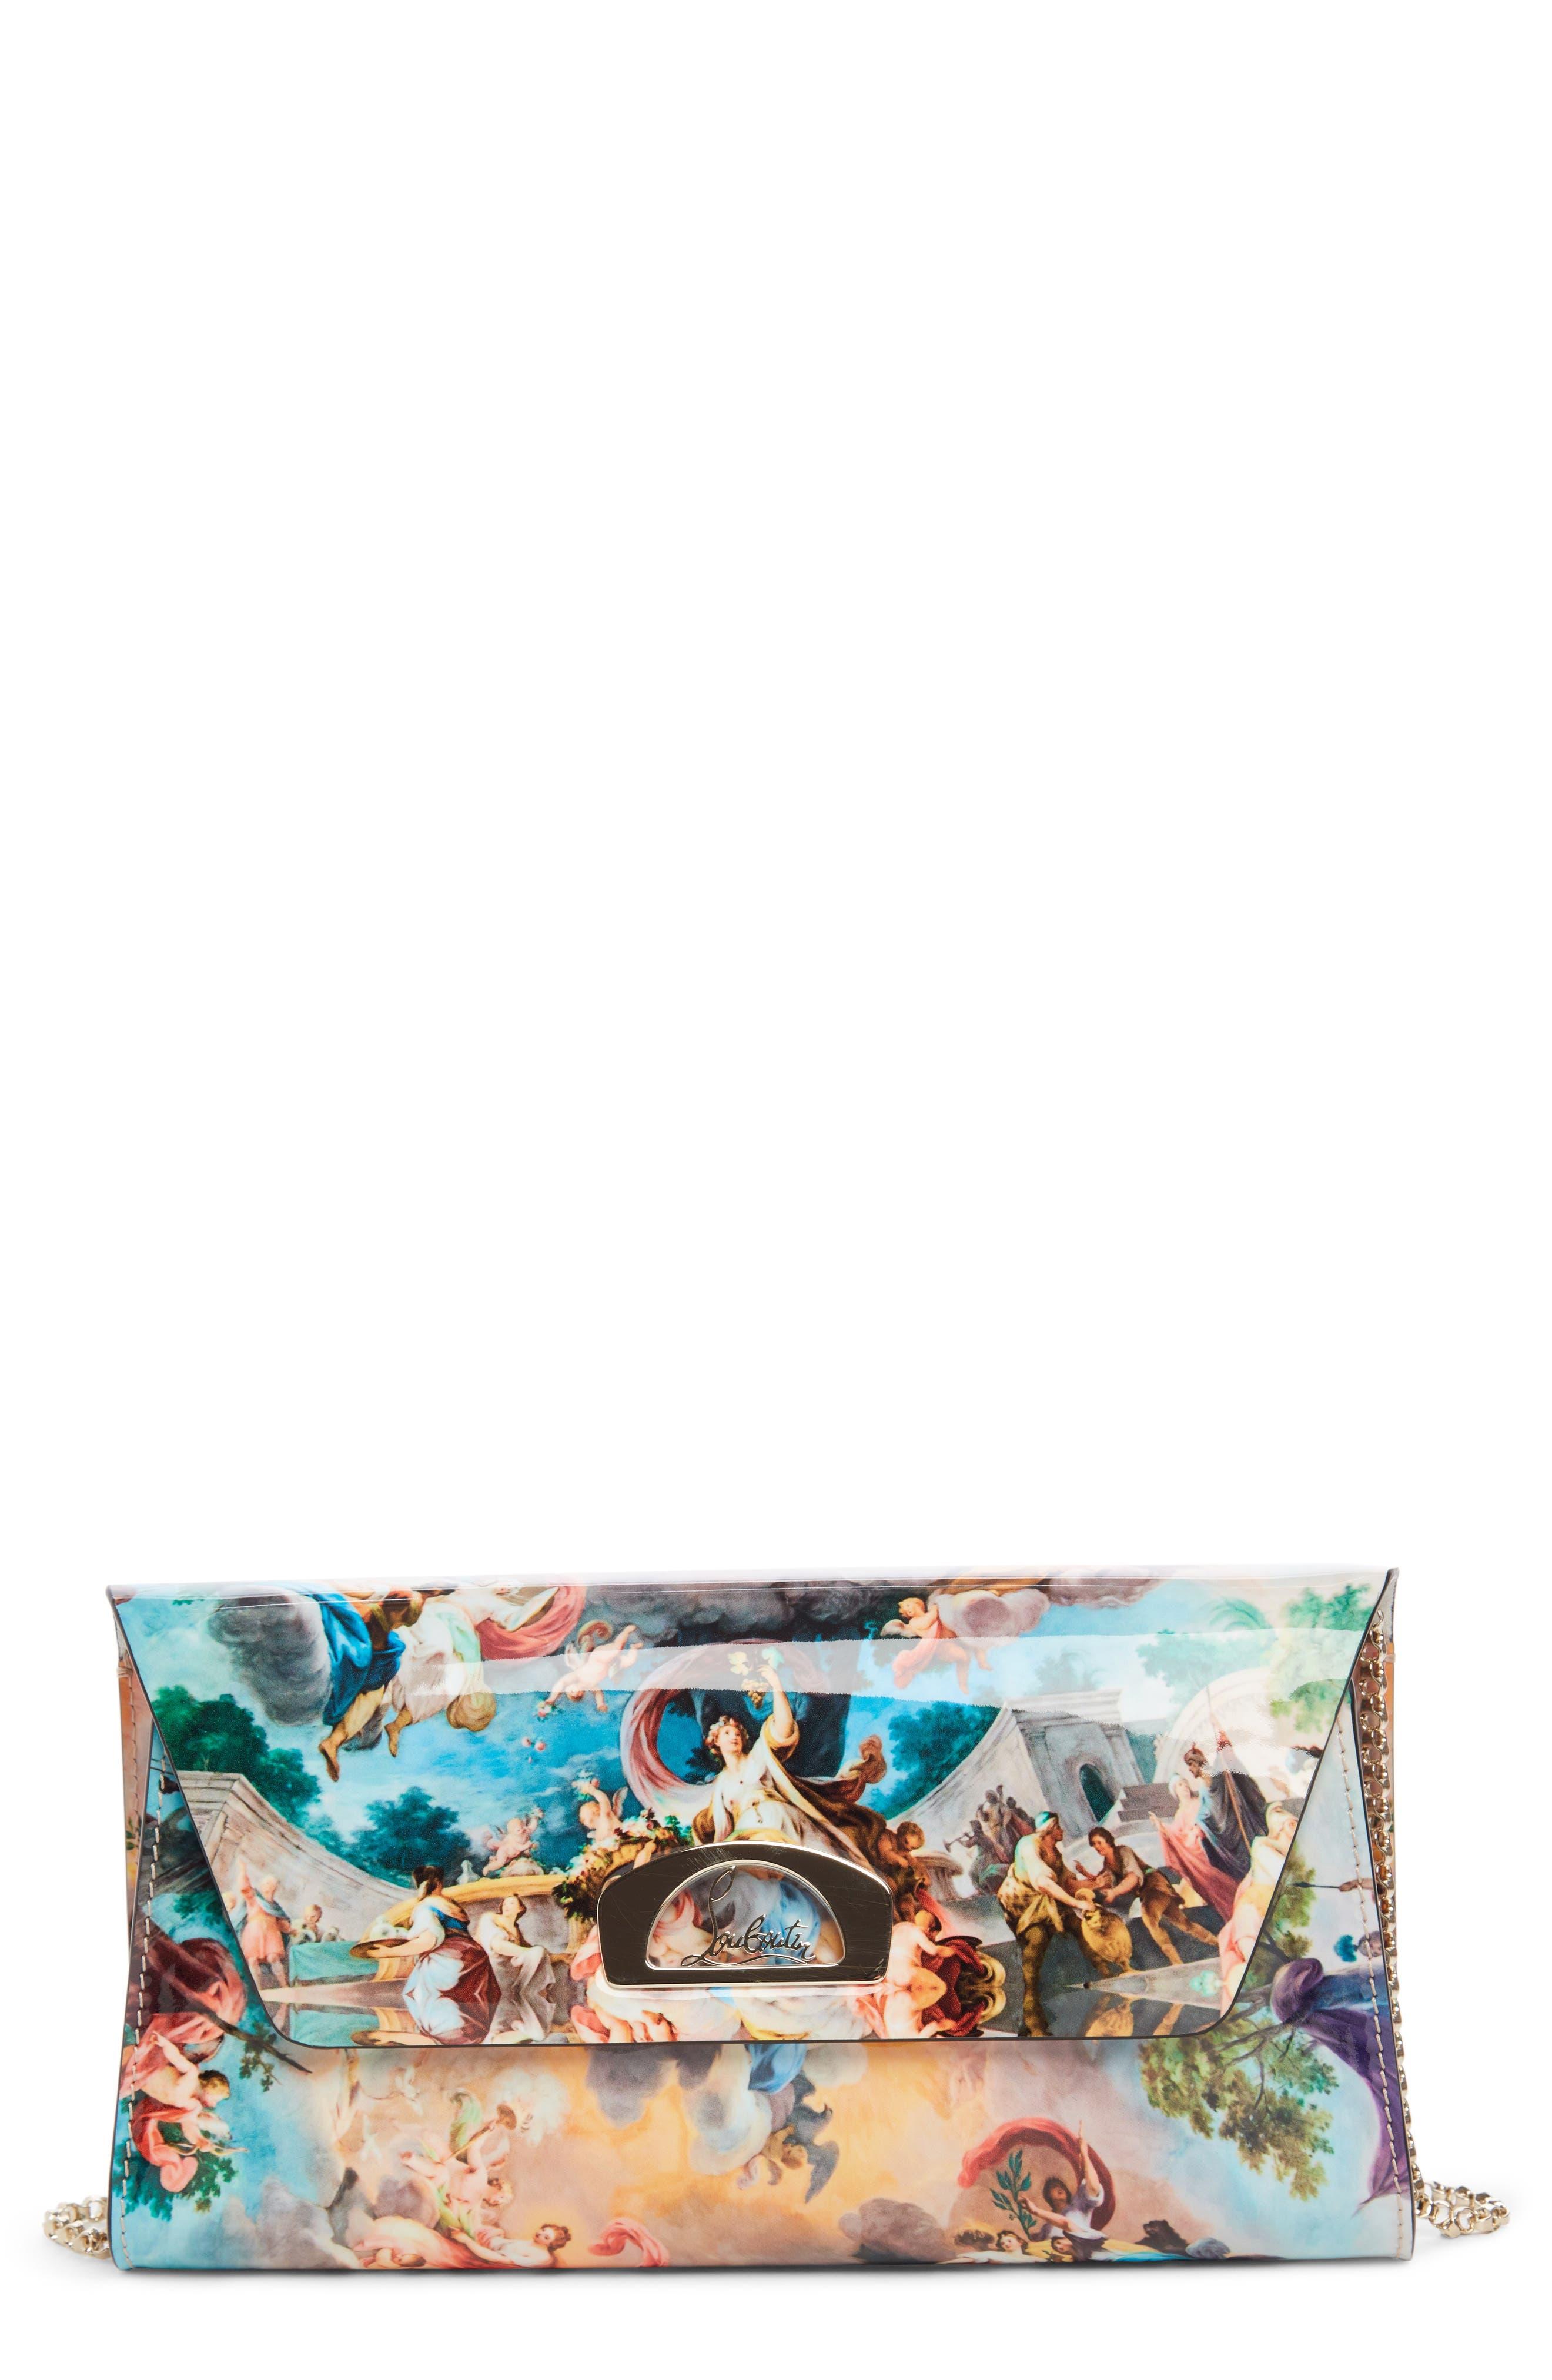 Vero Dodat Fresco Print Leather Clutch,                         Main,                         color, Blue Multi